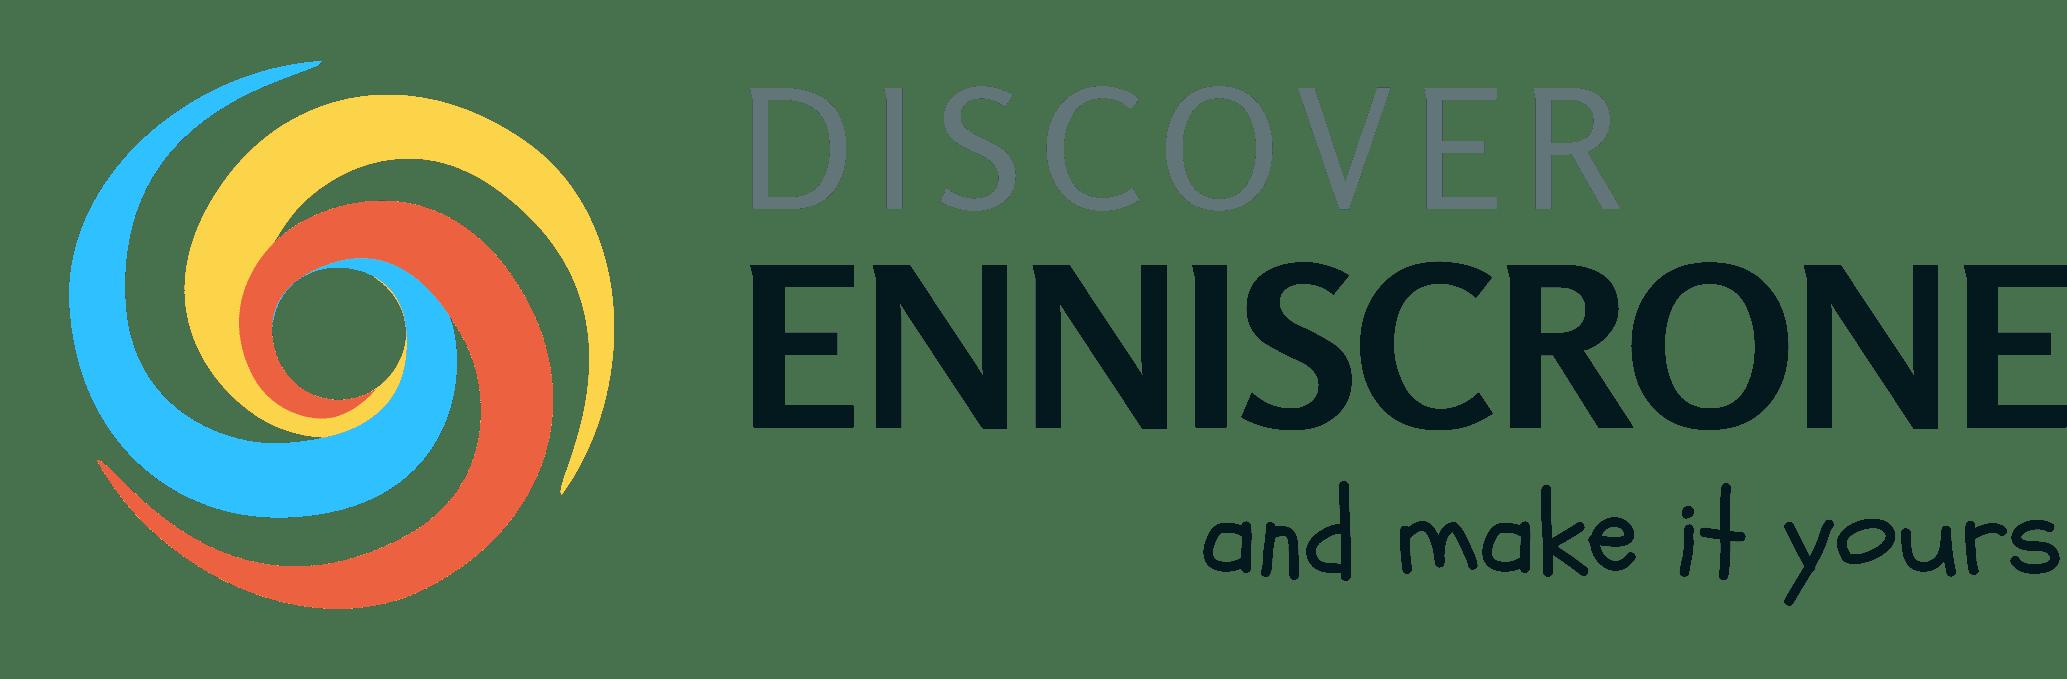 Discover Enniscrone